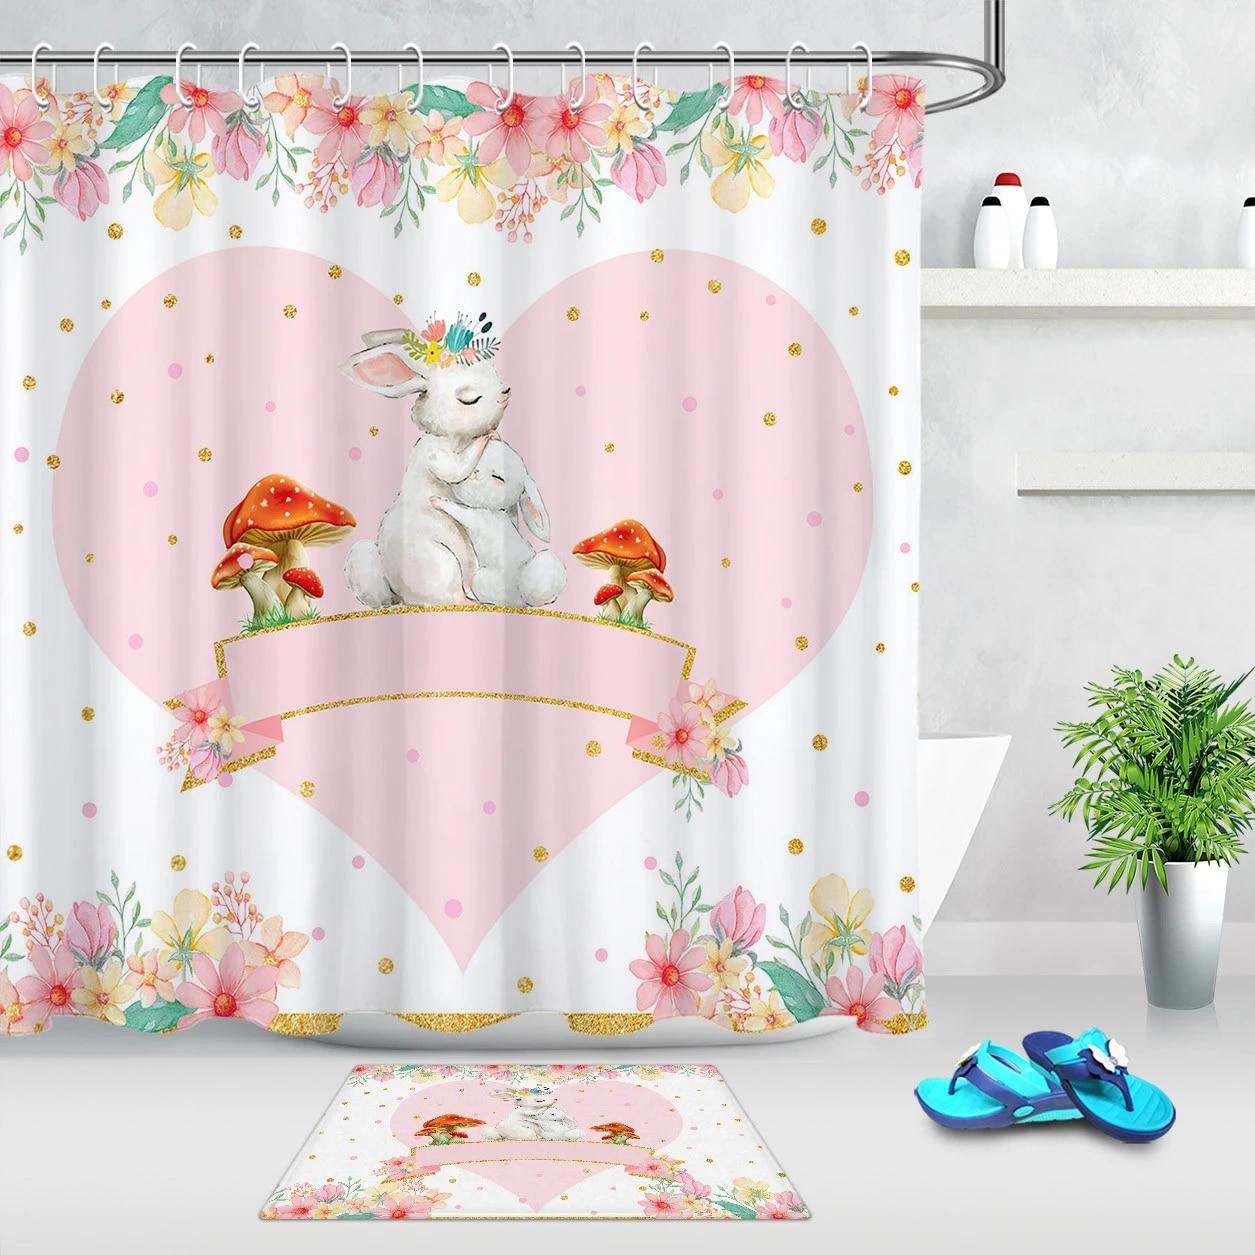 cartoon animals rabbit shower curtain pink love flower mushroom waterproof fabric bathroom bath curtains mother s day gift